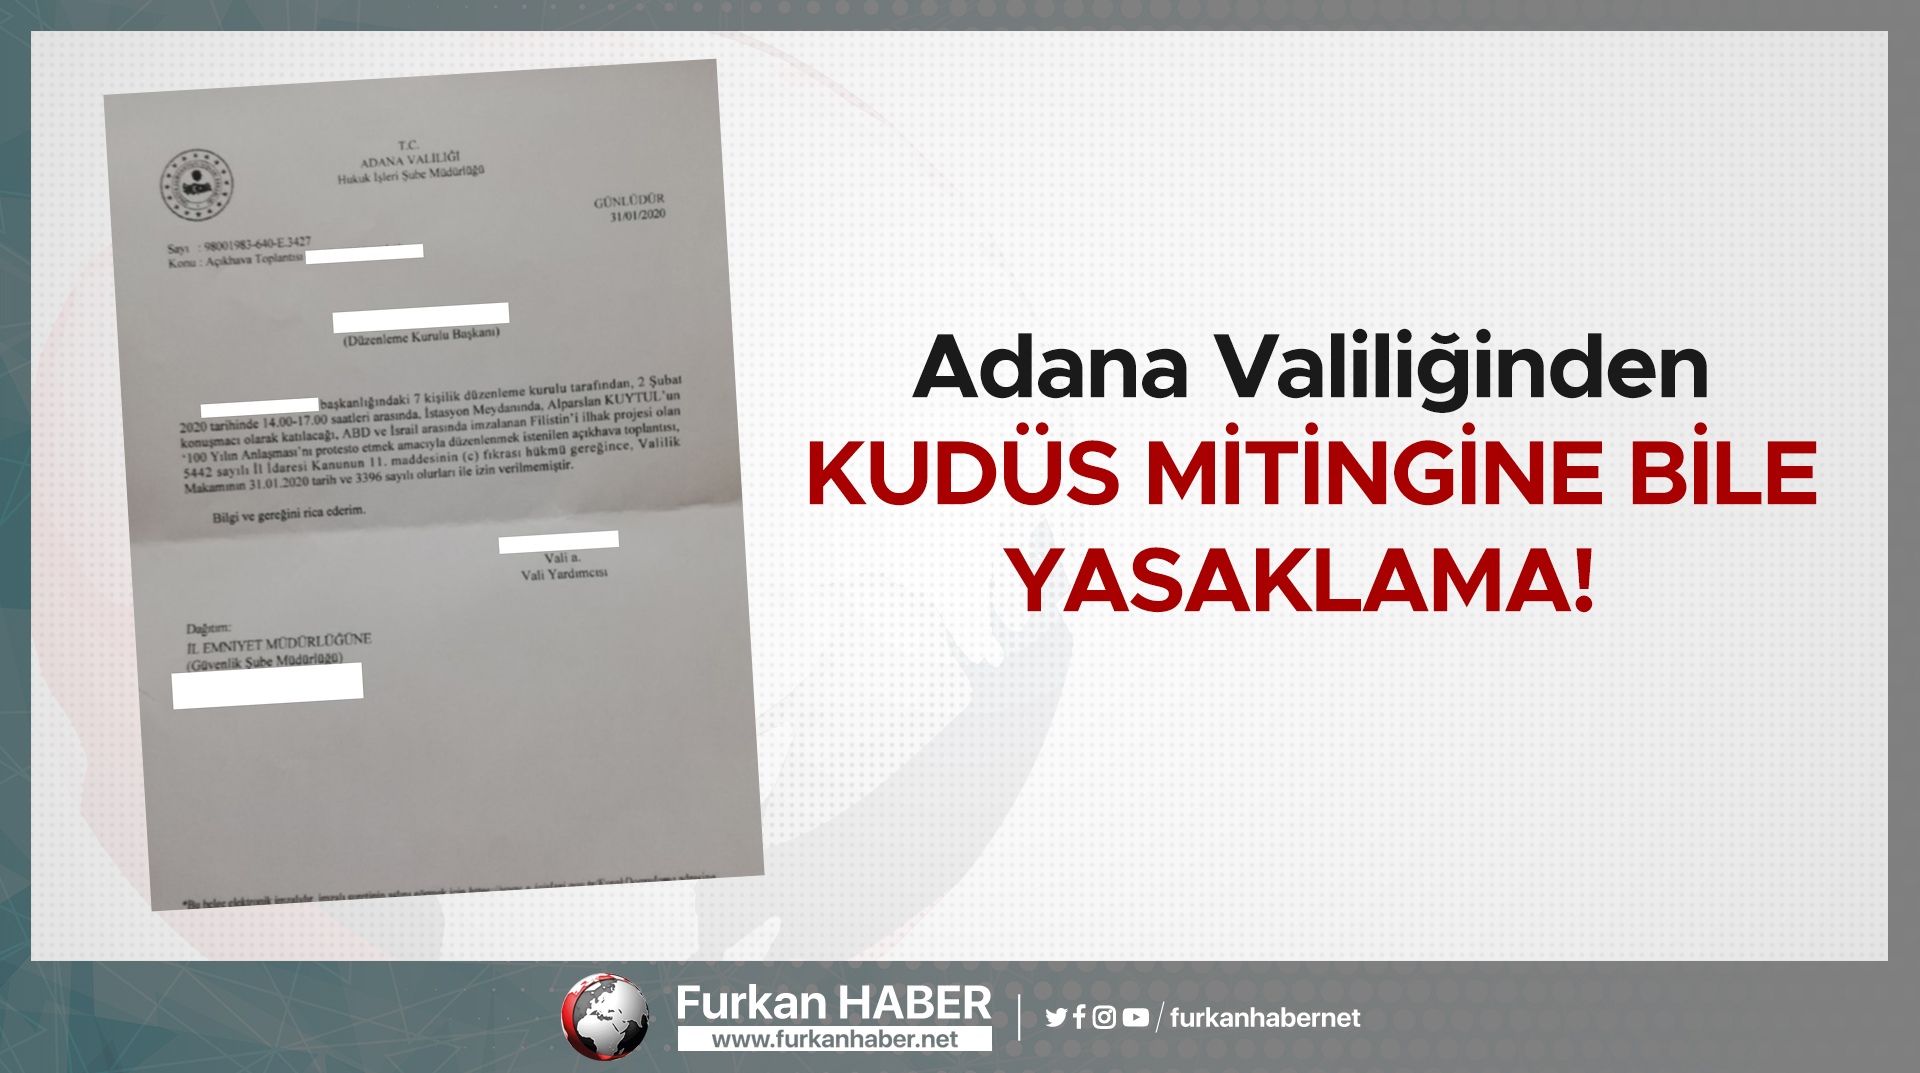 Adana Valiliğinden Kudüs Mitingine Bile Yasaklama!